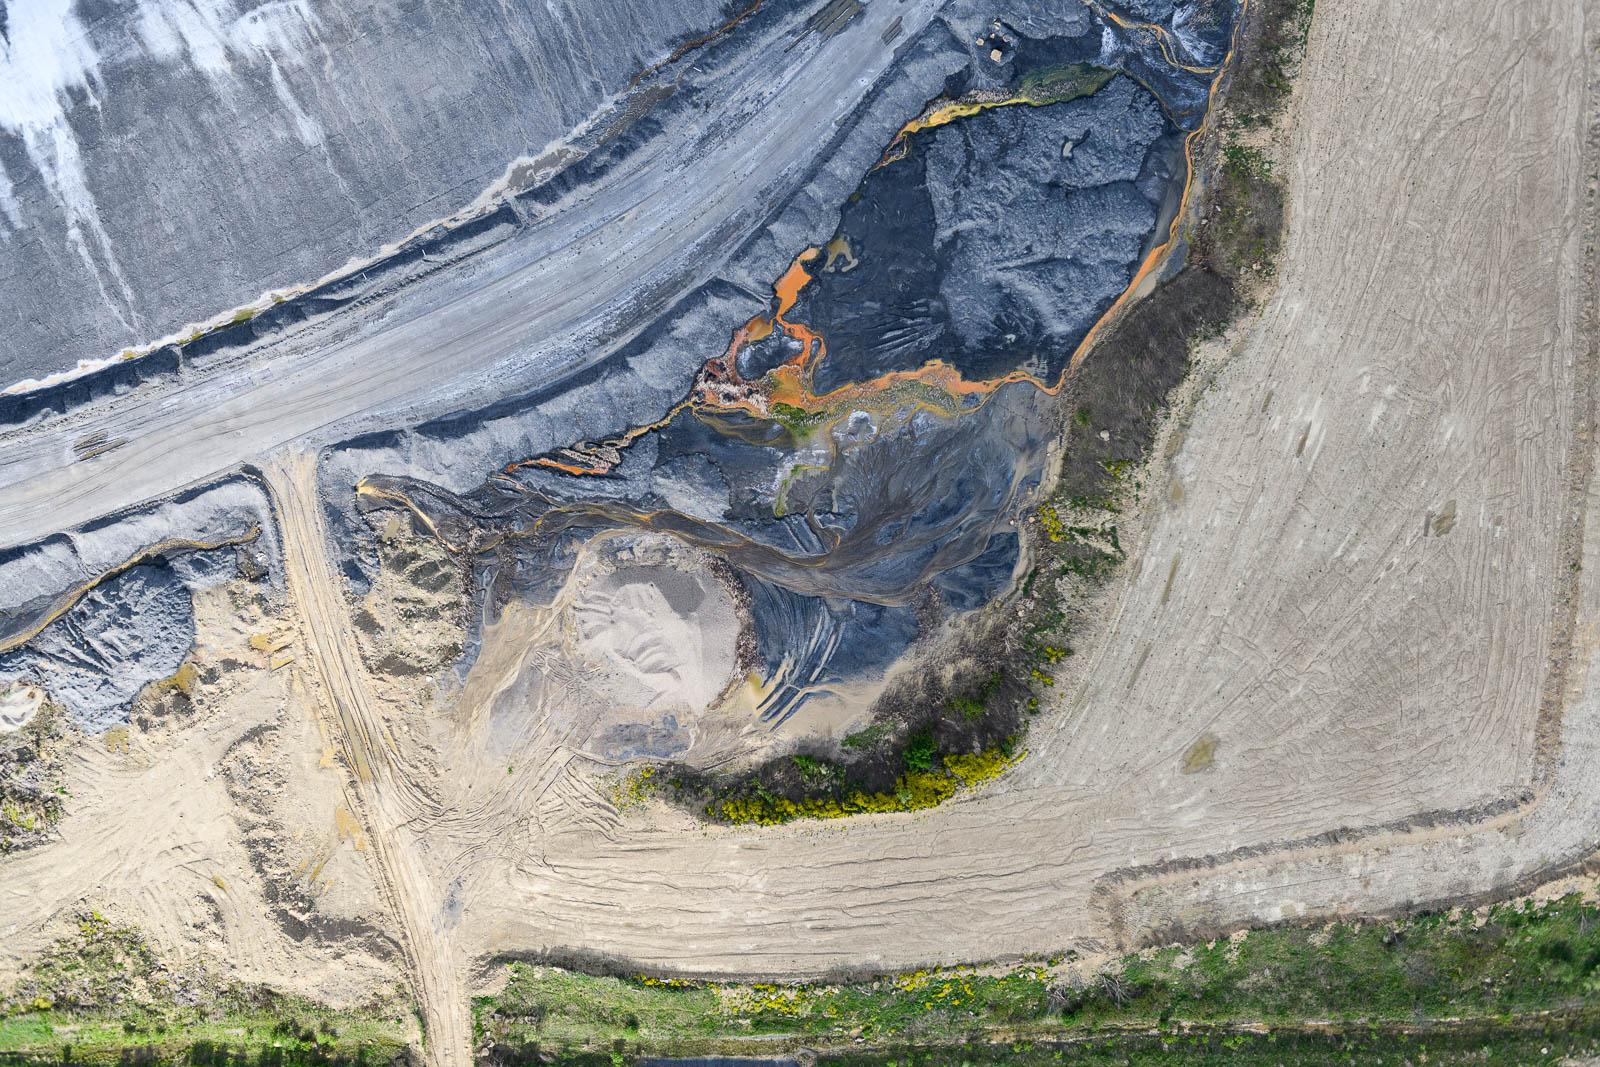 The excavation of coal